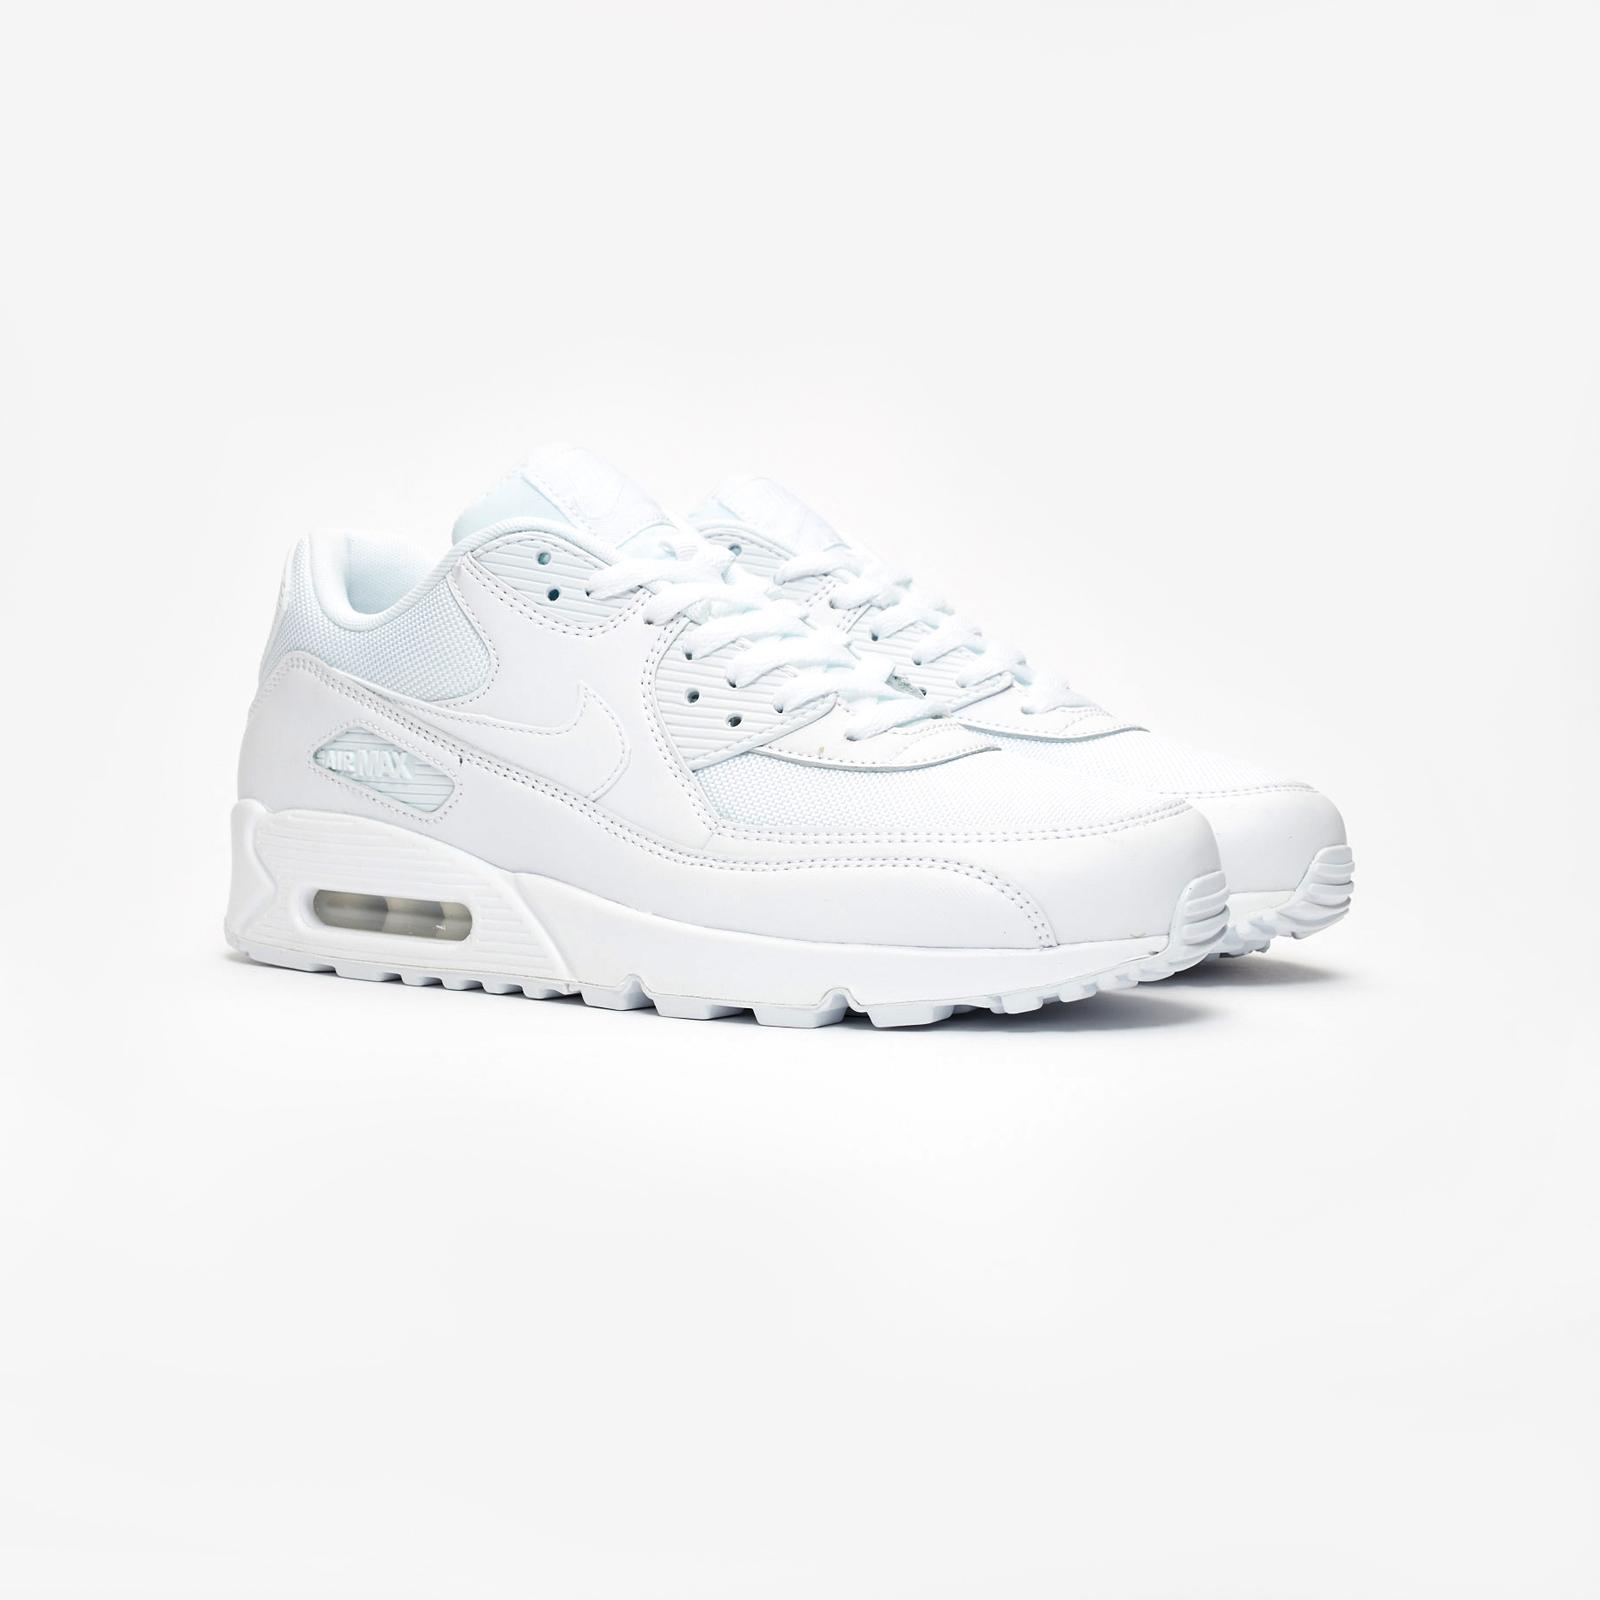 newest 6d3ae c98a9 Nike Air Max 90 Essential - 537384-111 - Sneakersnstuff ...